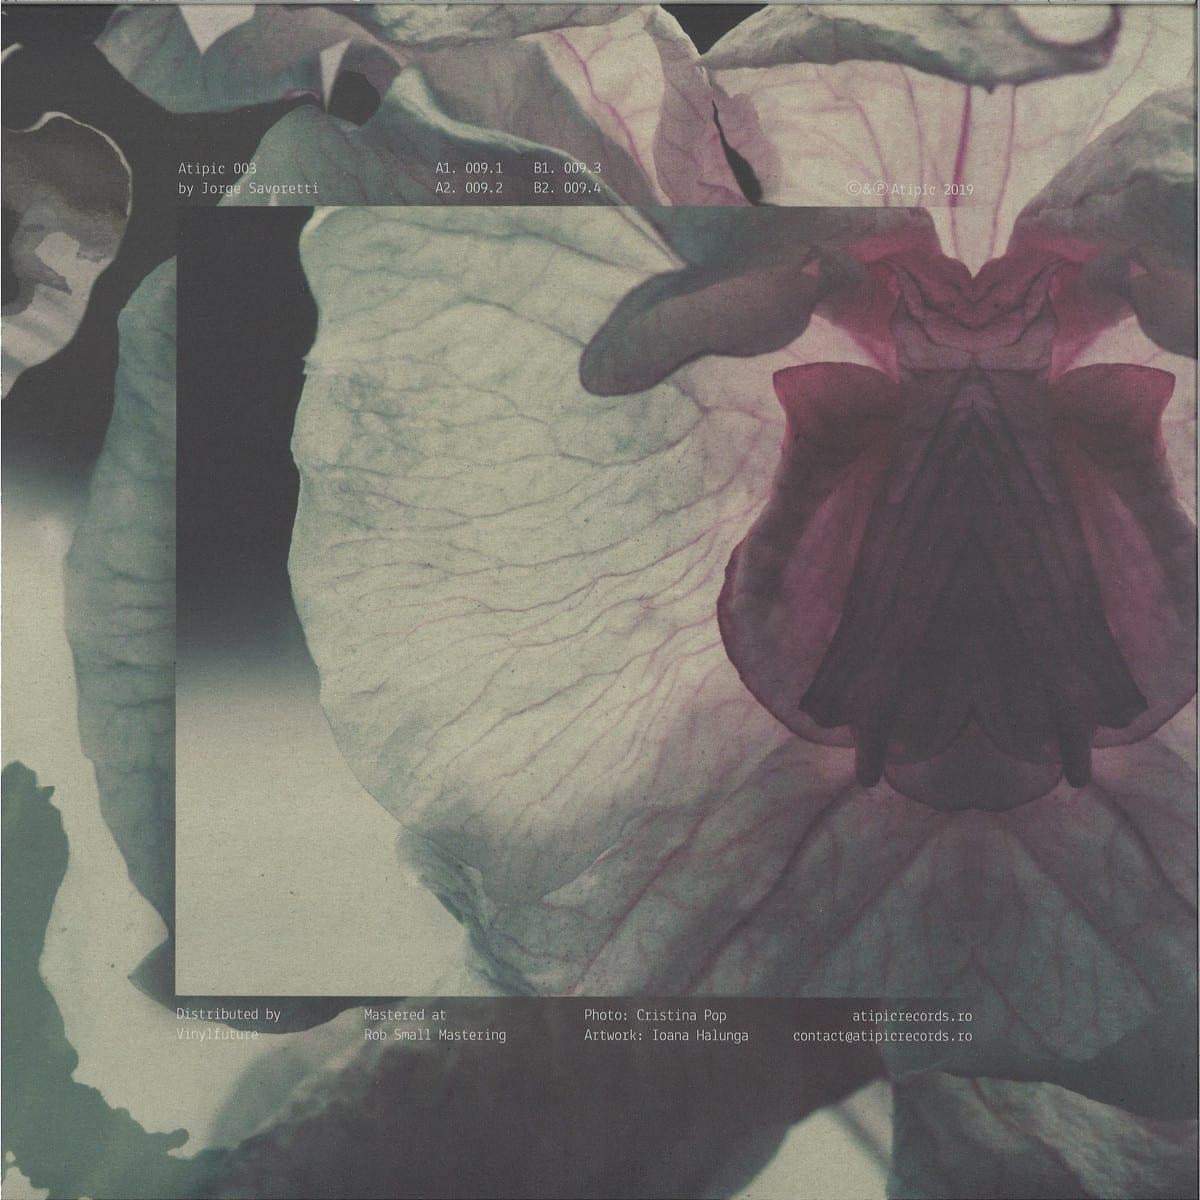 Jorge Savoretti - ATIPIC009 [Atipic] 02